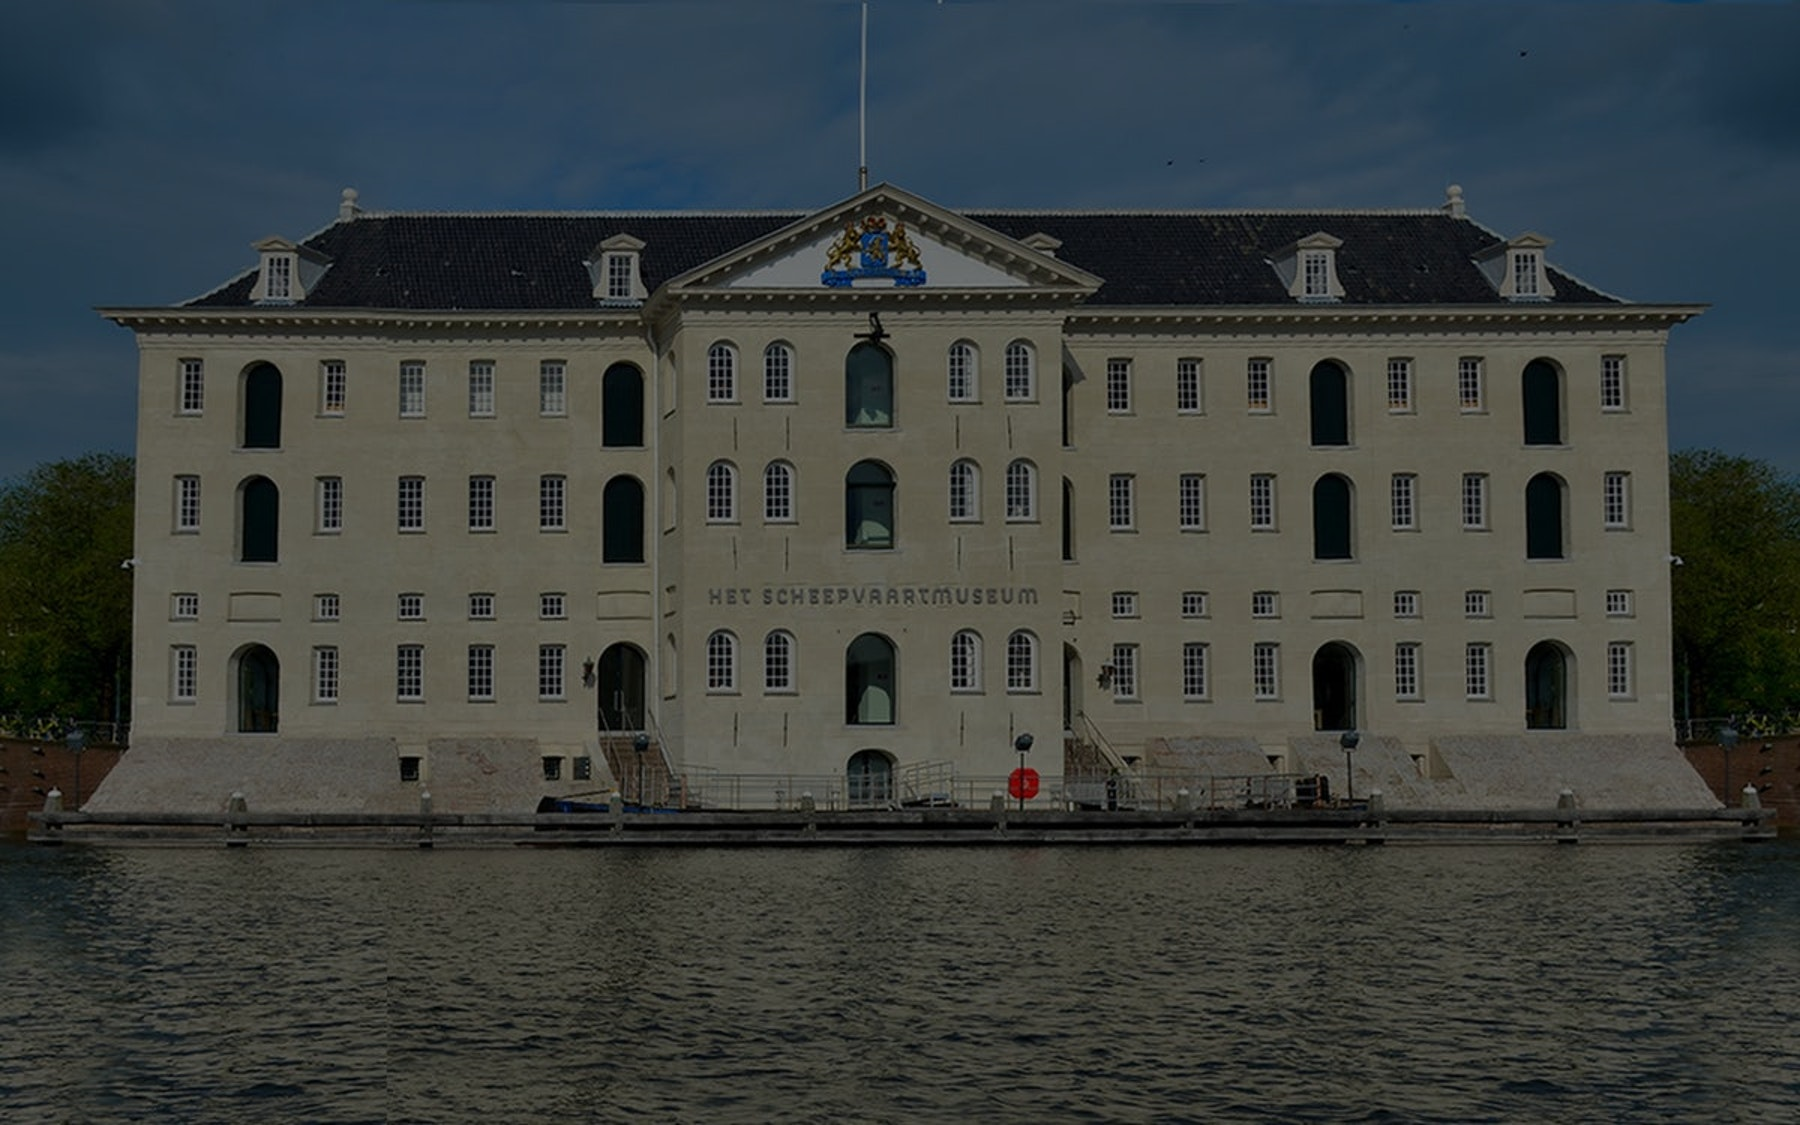 National Maritime Museum Amsterdam Tickets